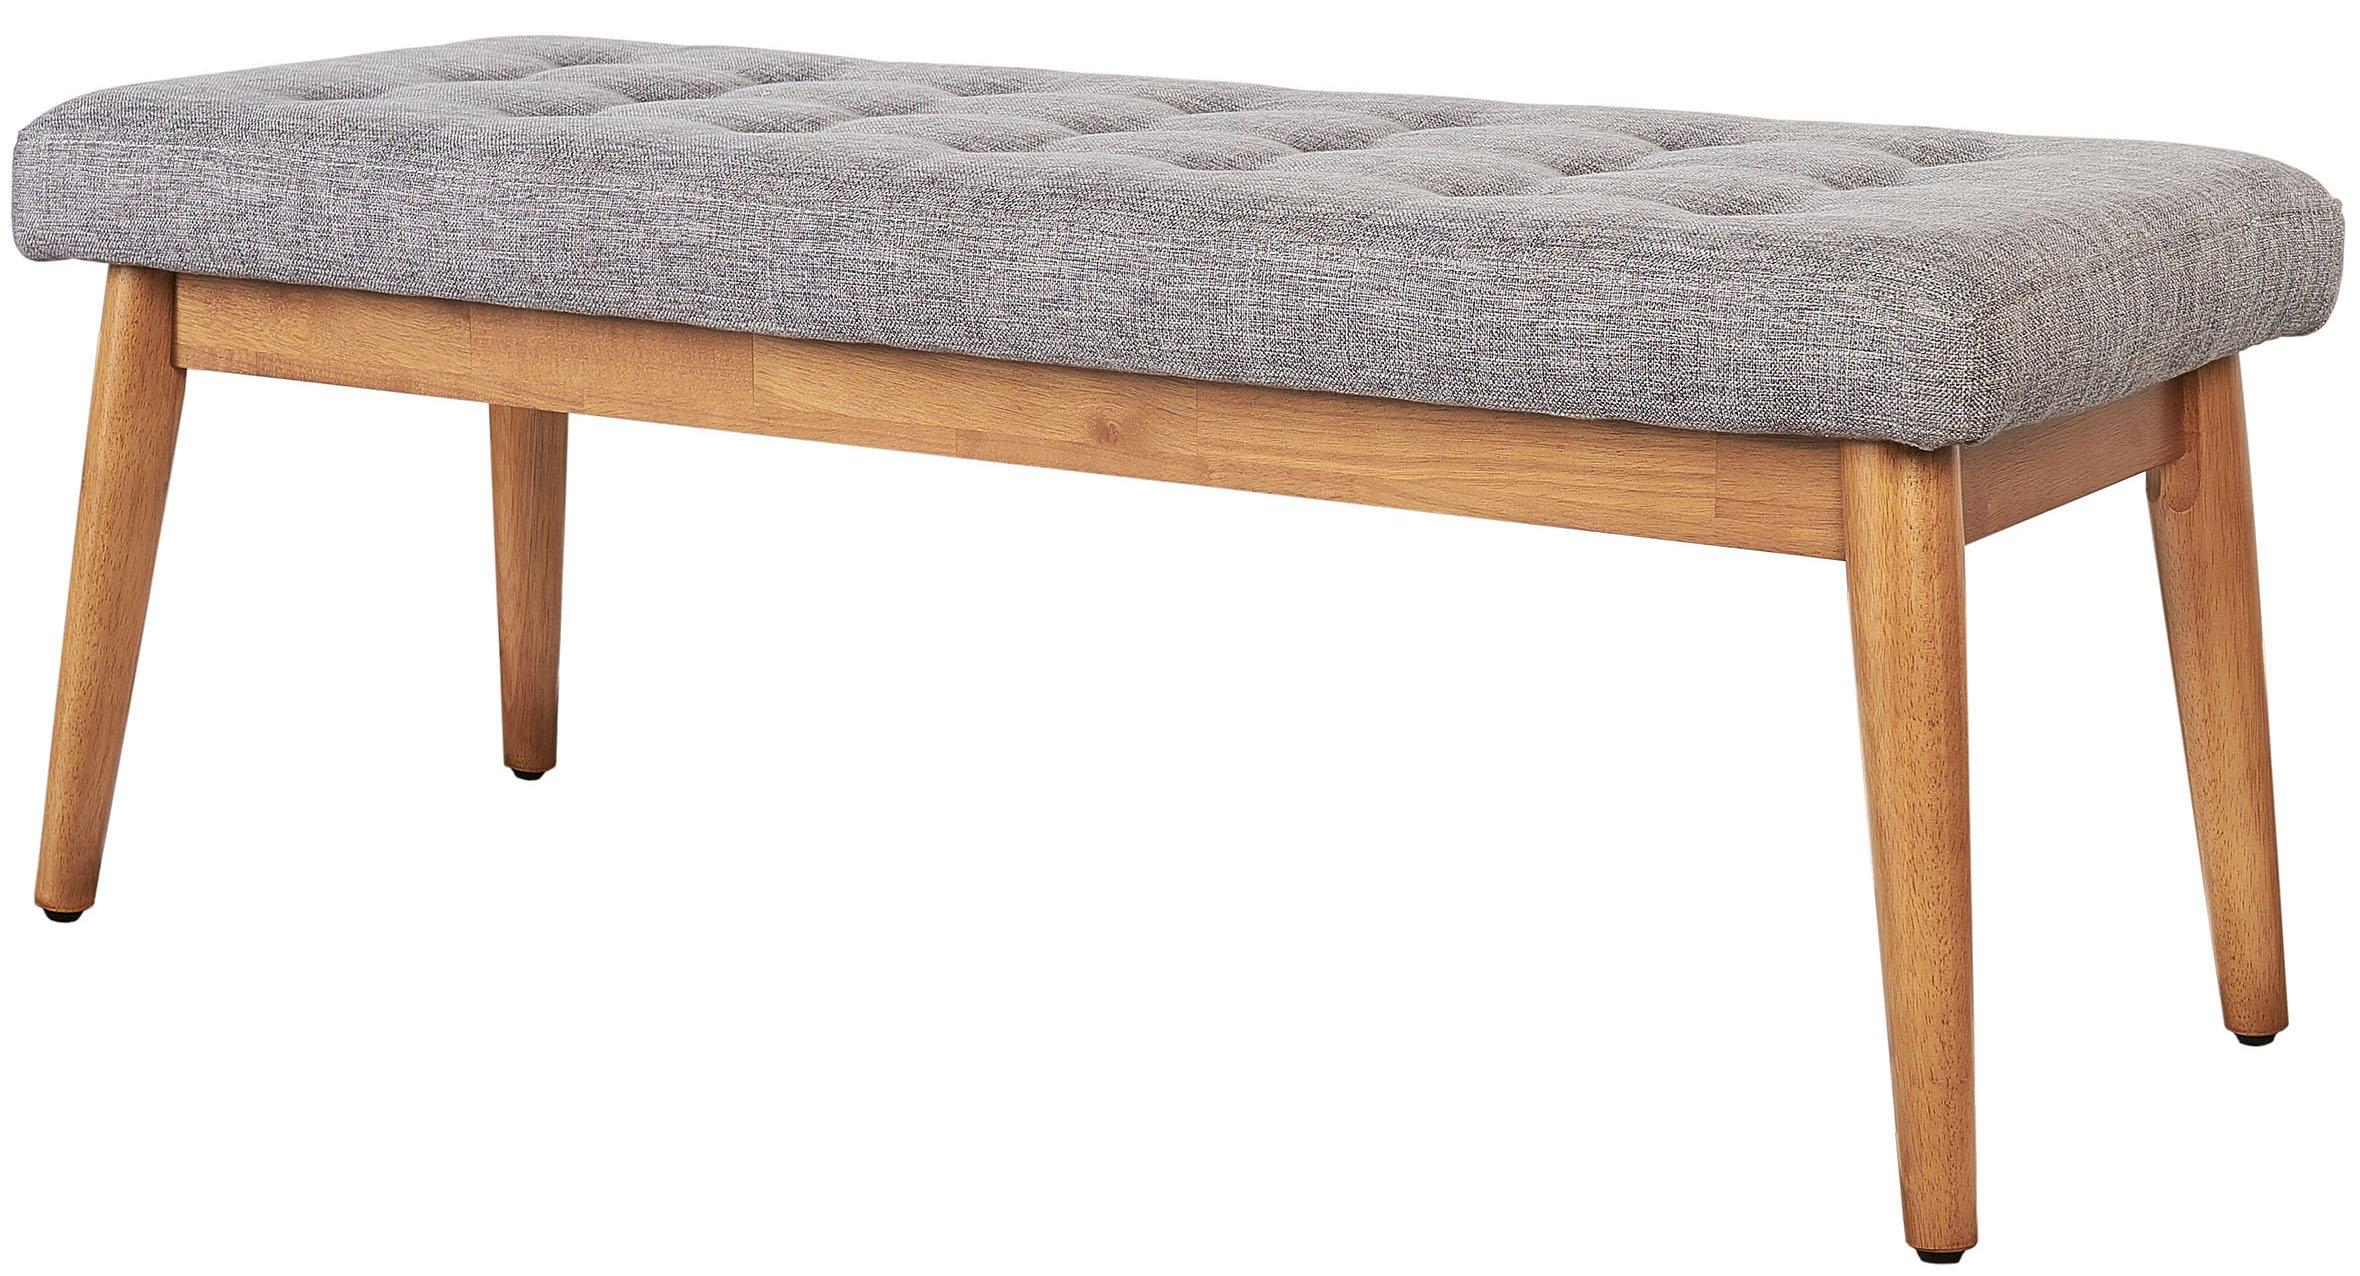 Crosley Furniture CF6019-AC Landon Upholstered Bench - Acorn